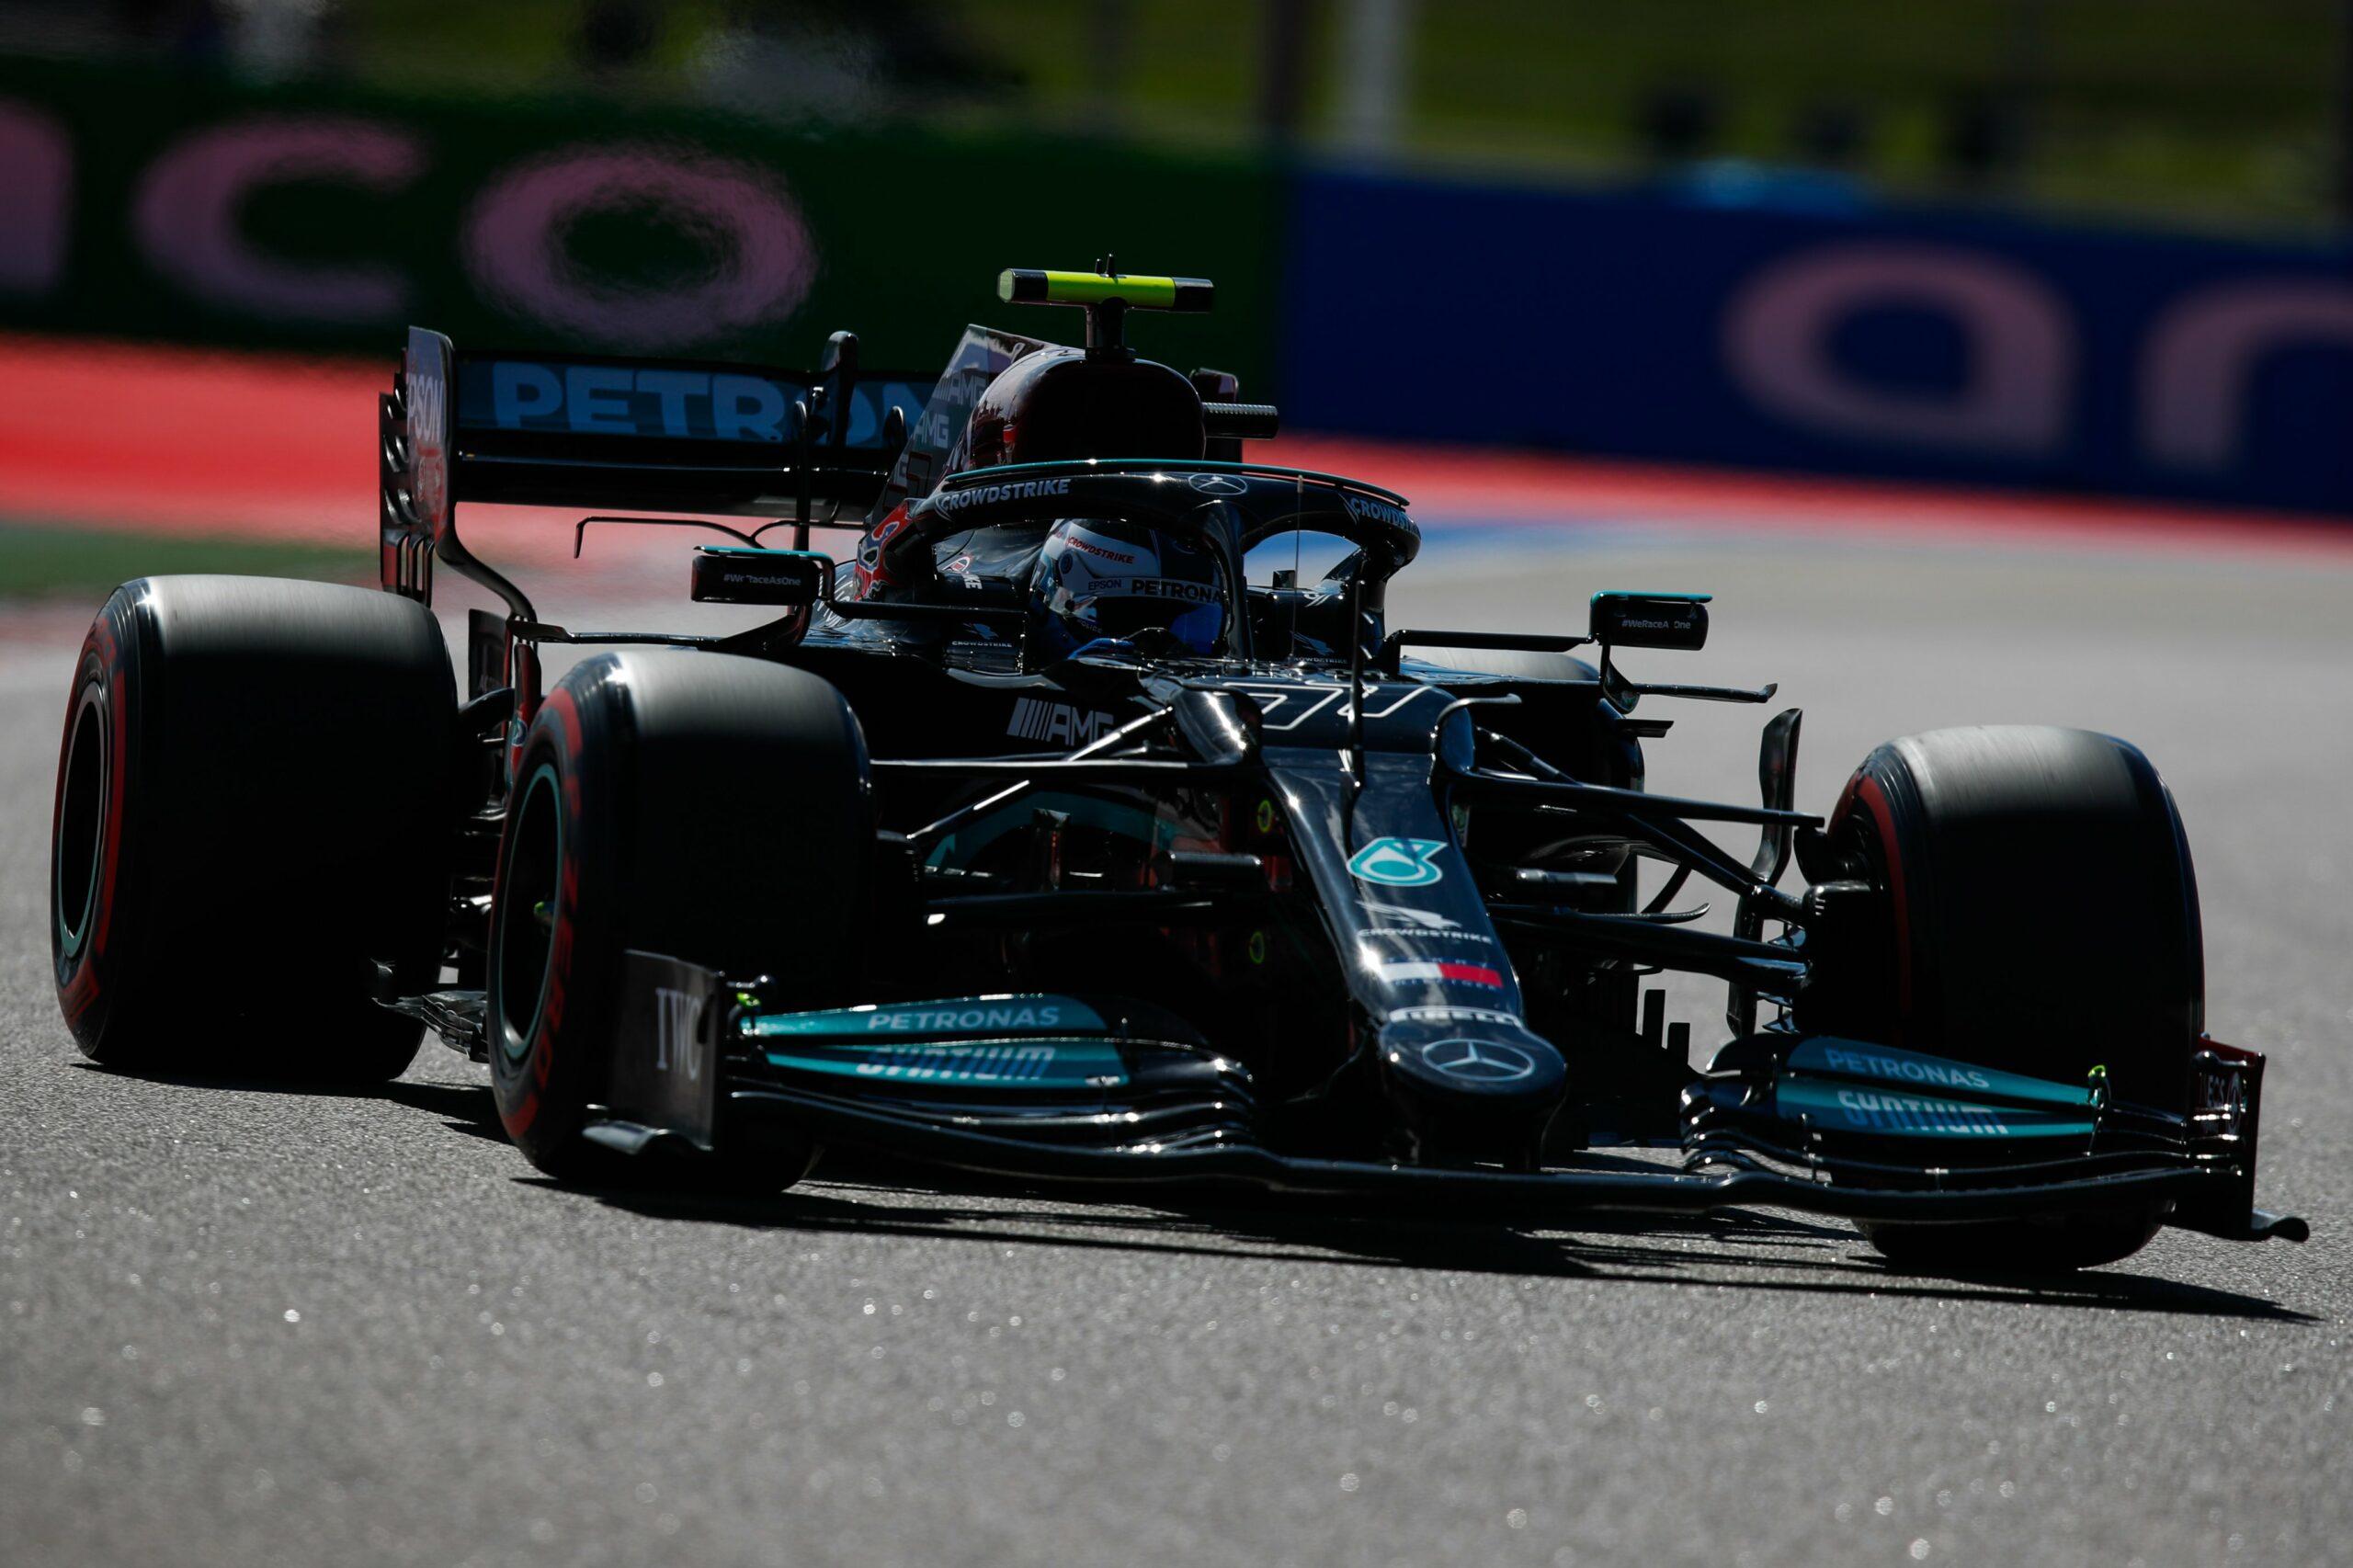 "F1 - <i class=""fab fa-creative-commons-sampling""></i> Revivez la deuxième séance d'essais libres du Grand Prix de Russie"